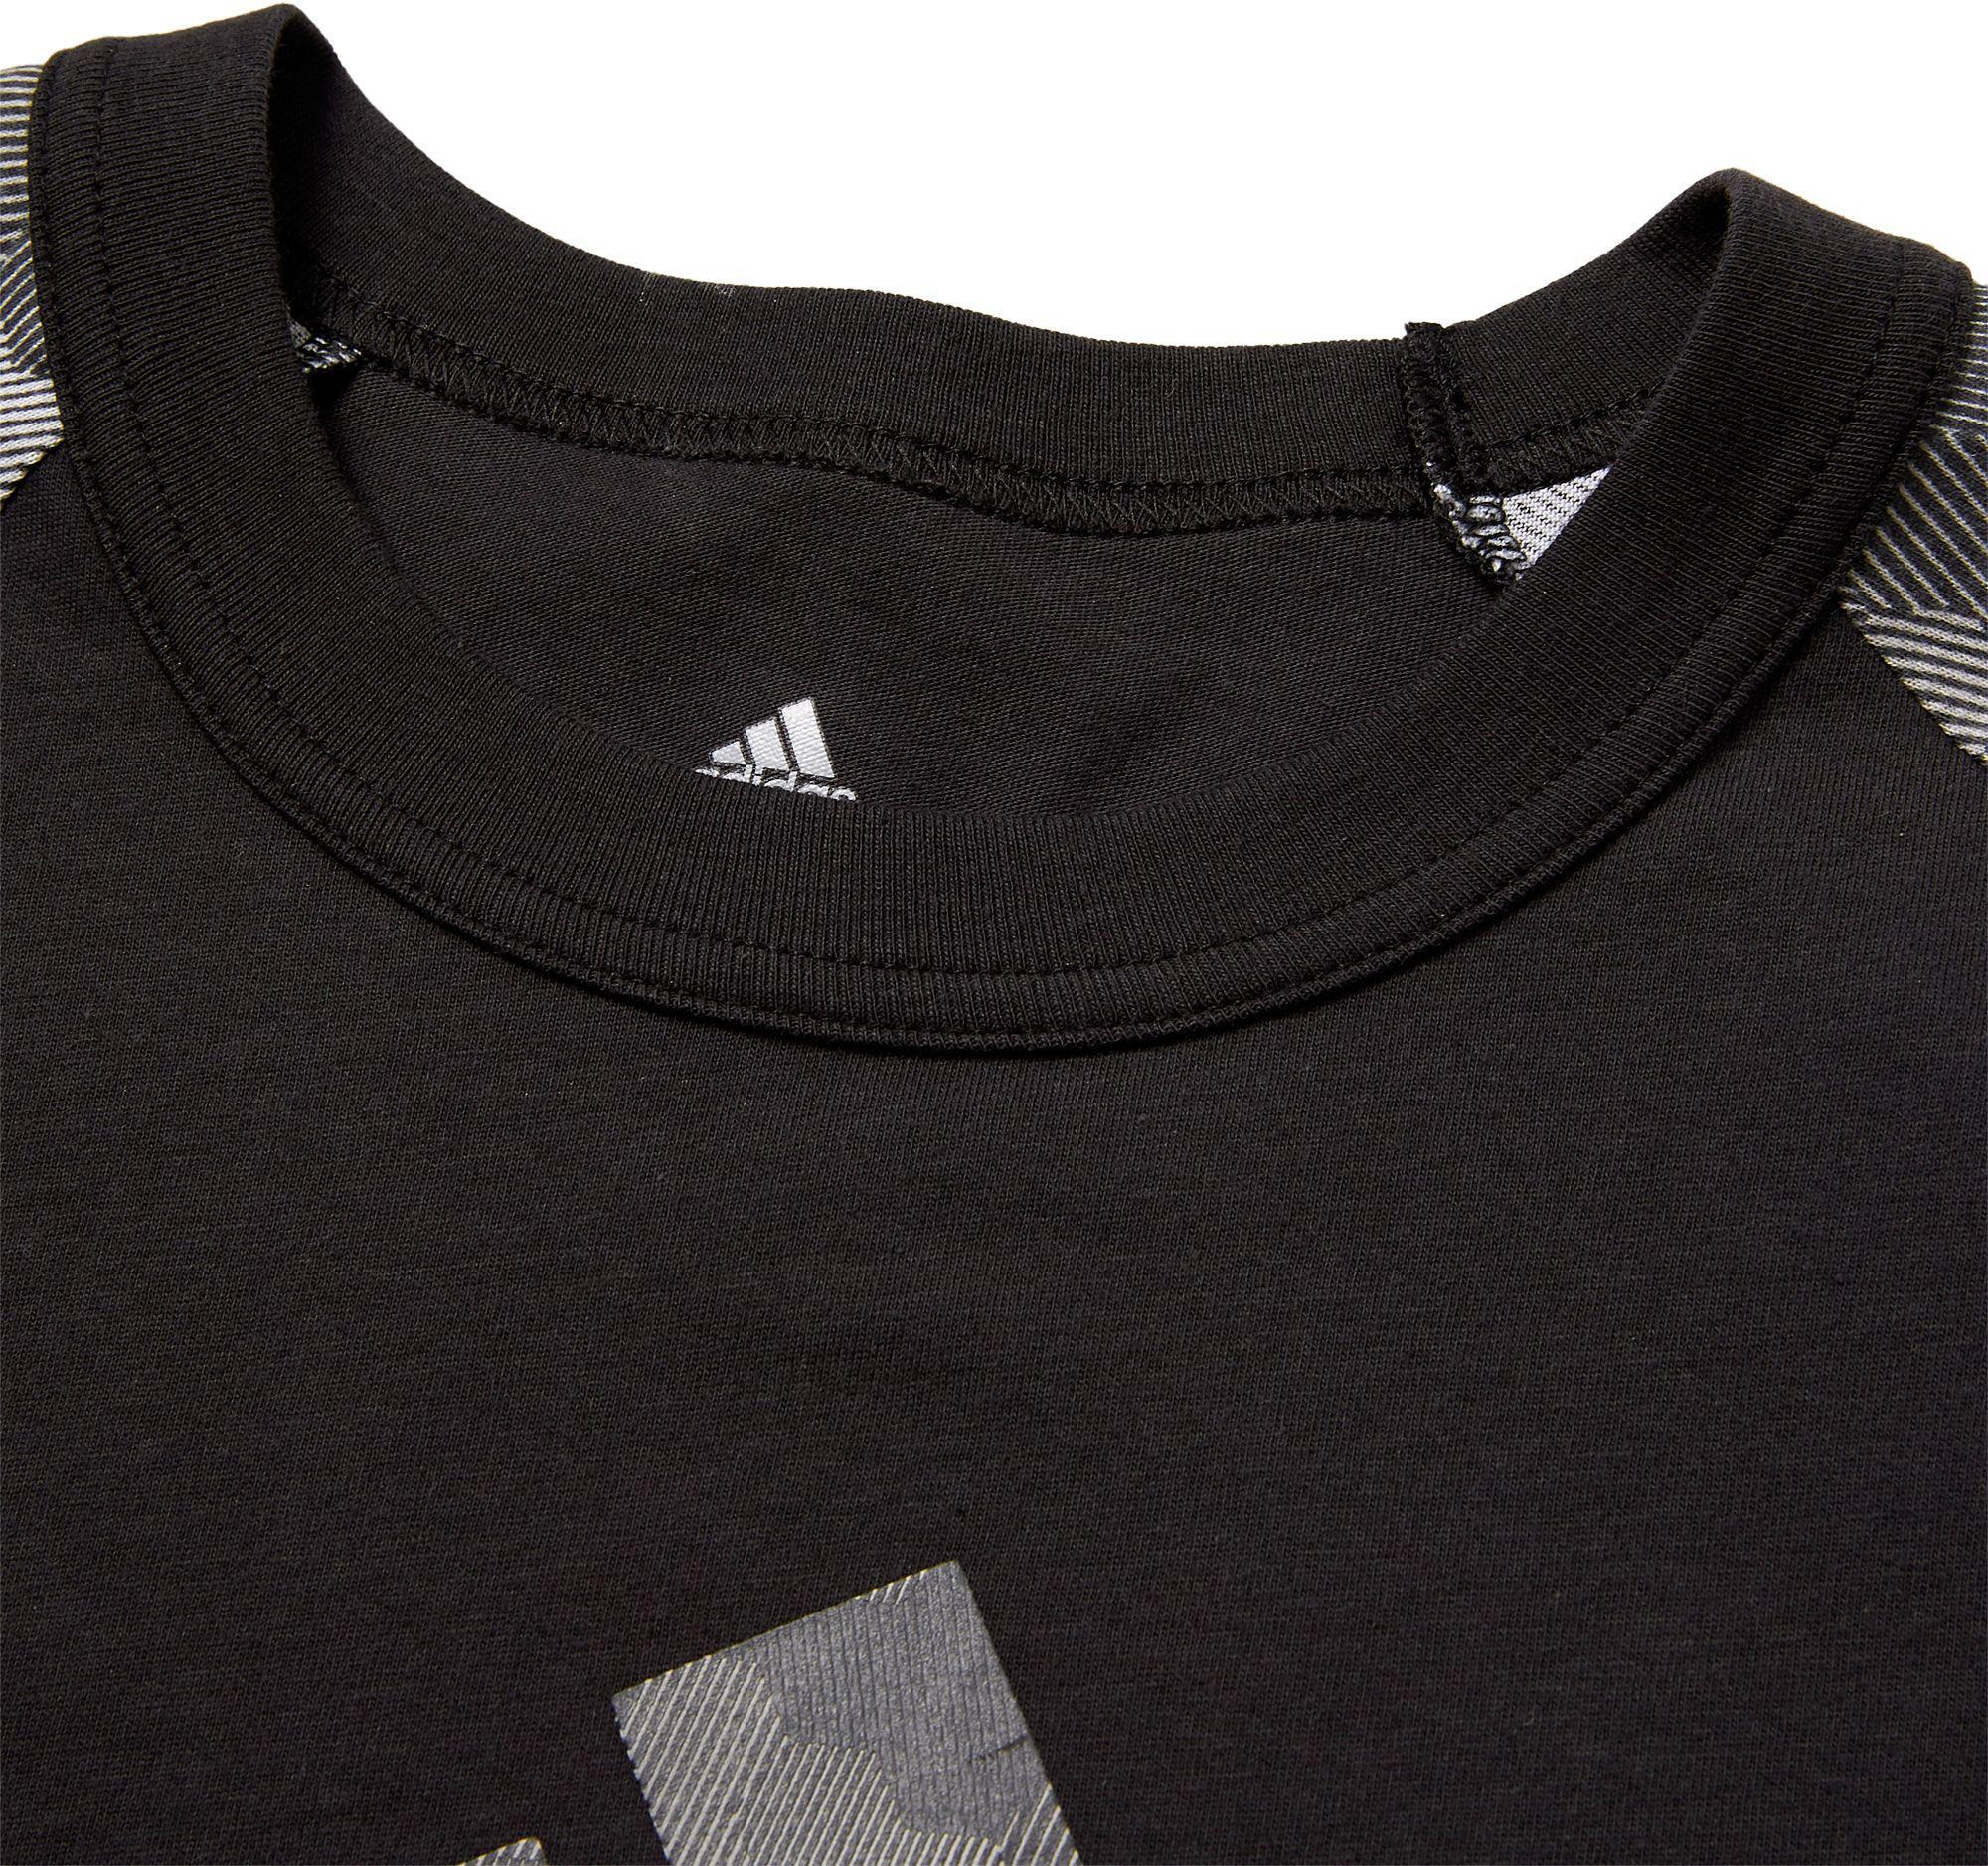 9ed859f42c4 Adidas - Gray Triple Stripe Printed 3⁄4 Sleeve Baseball Shirt for Men -  Lyst. View fullscreen